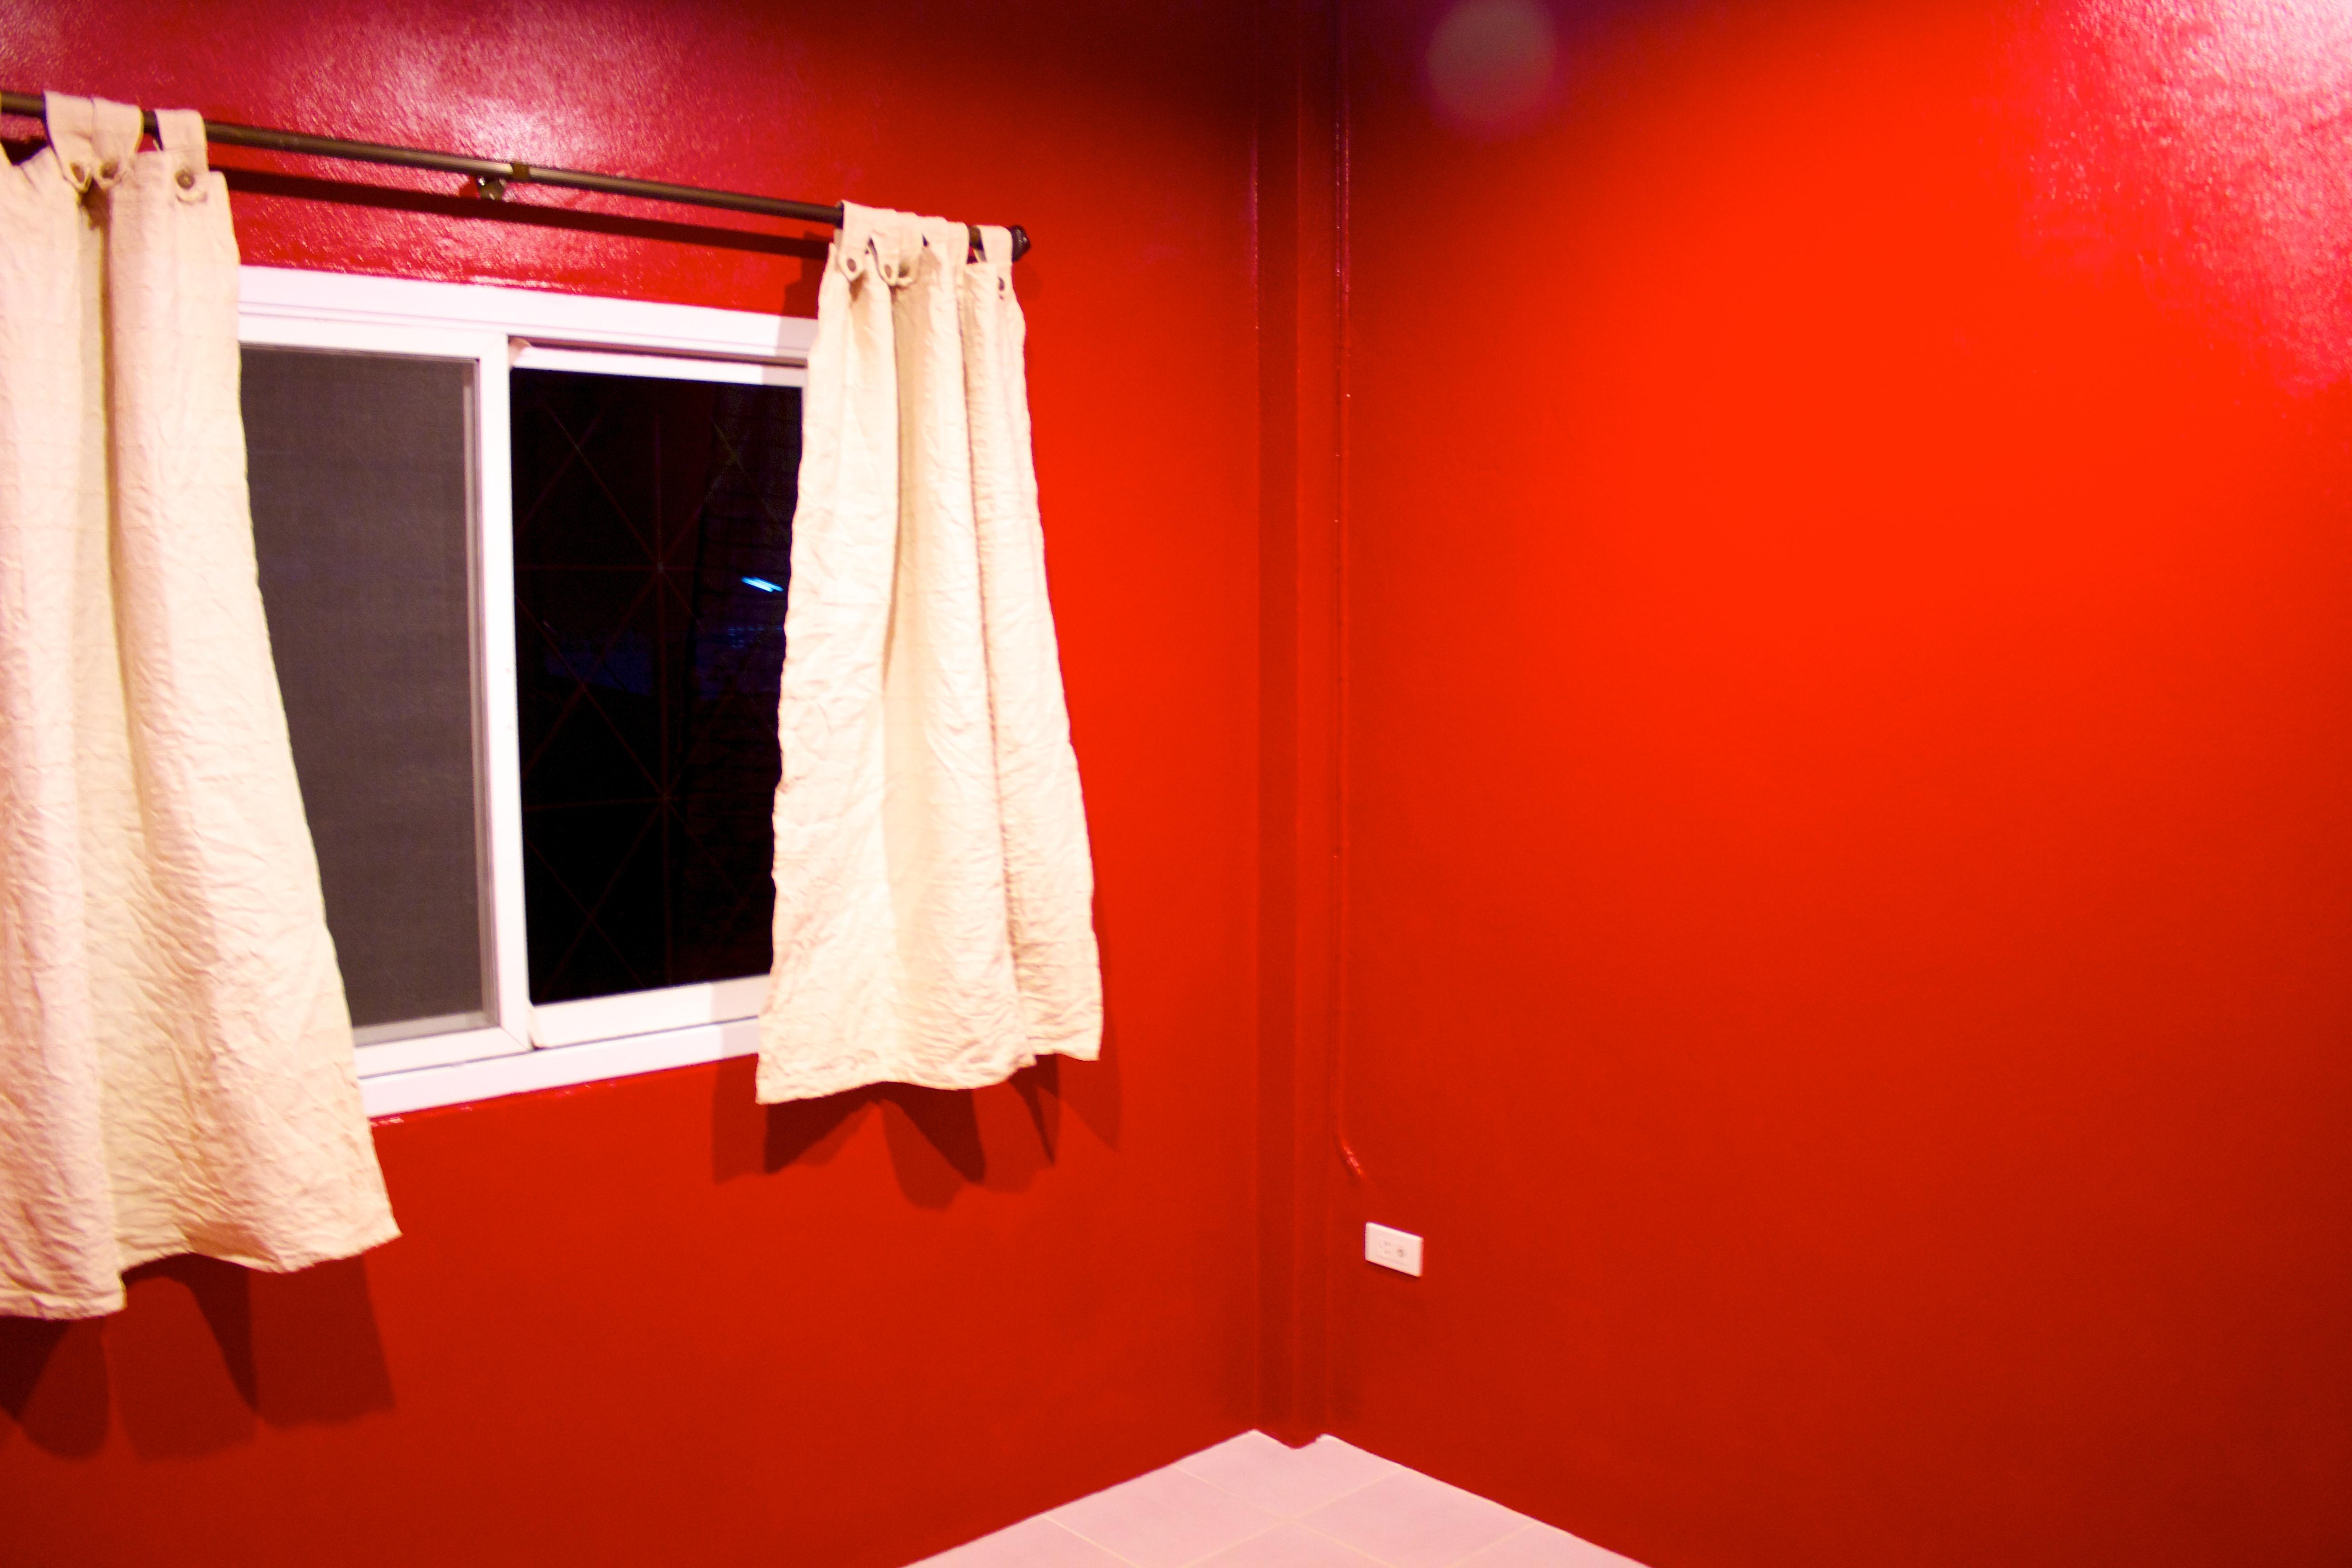 2012-03-18-red-room1.jpg